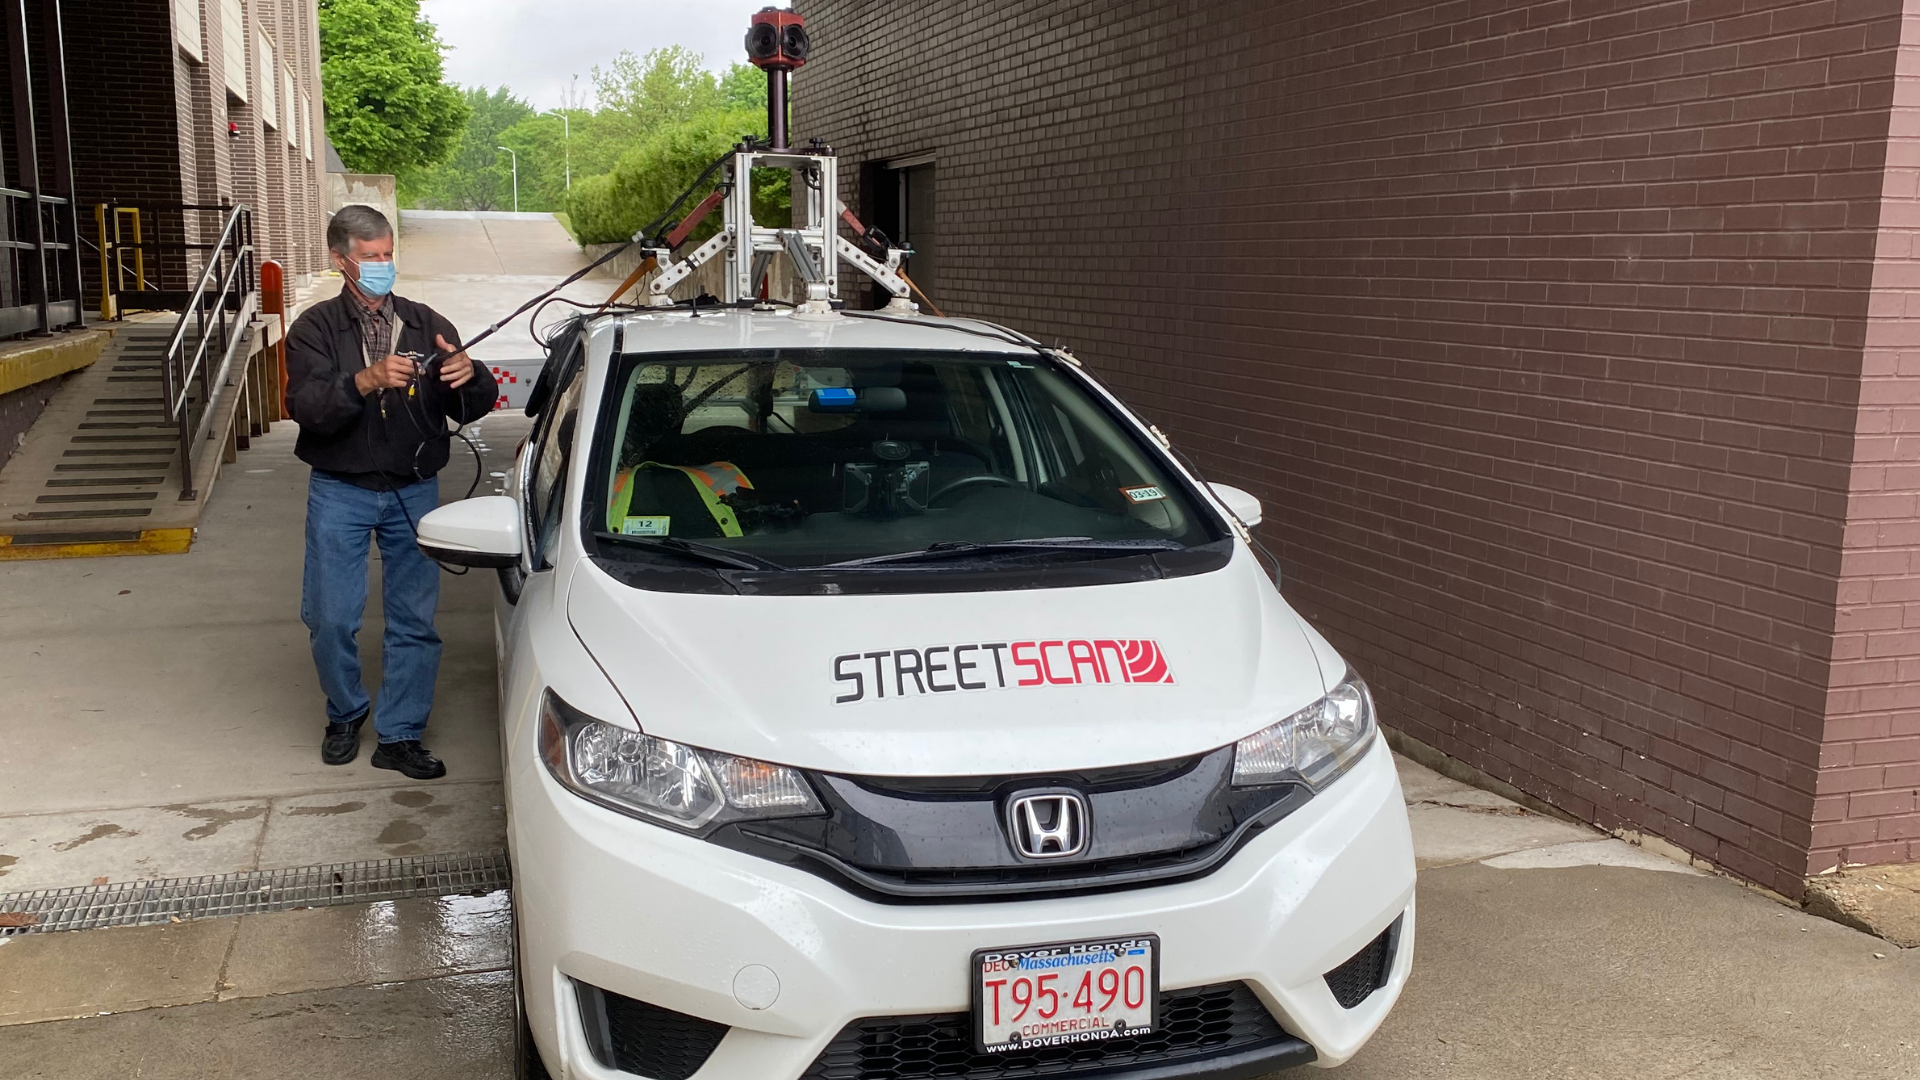 StreetScan car and driver Alan Rowlandson